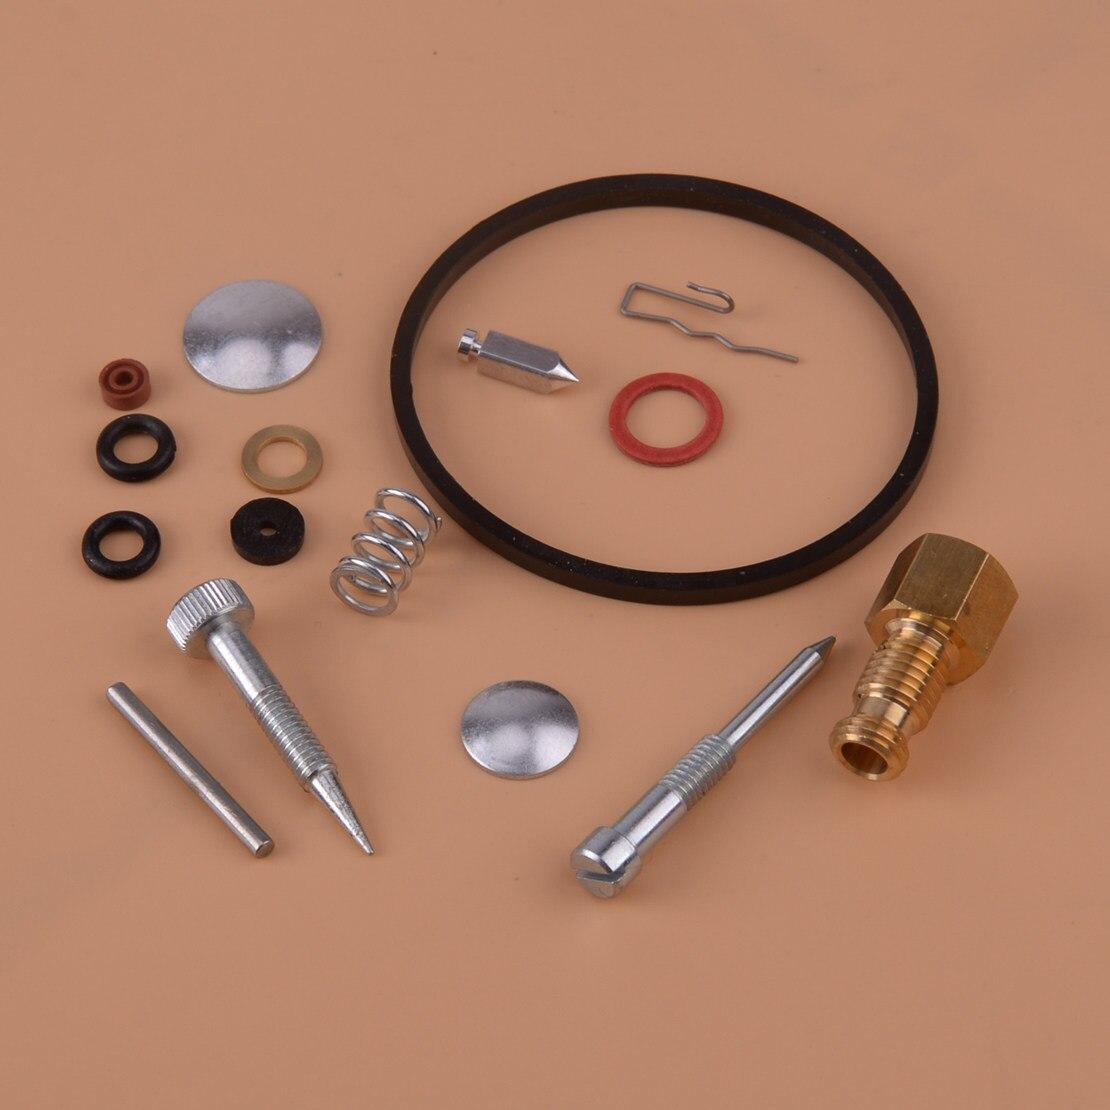 5X Replaces Seal O-Ring Float Bowl Gasket For Honda GX200//GX160 Carburetor Carb